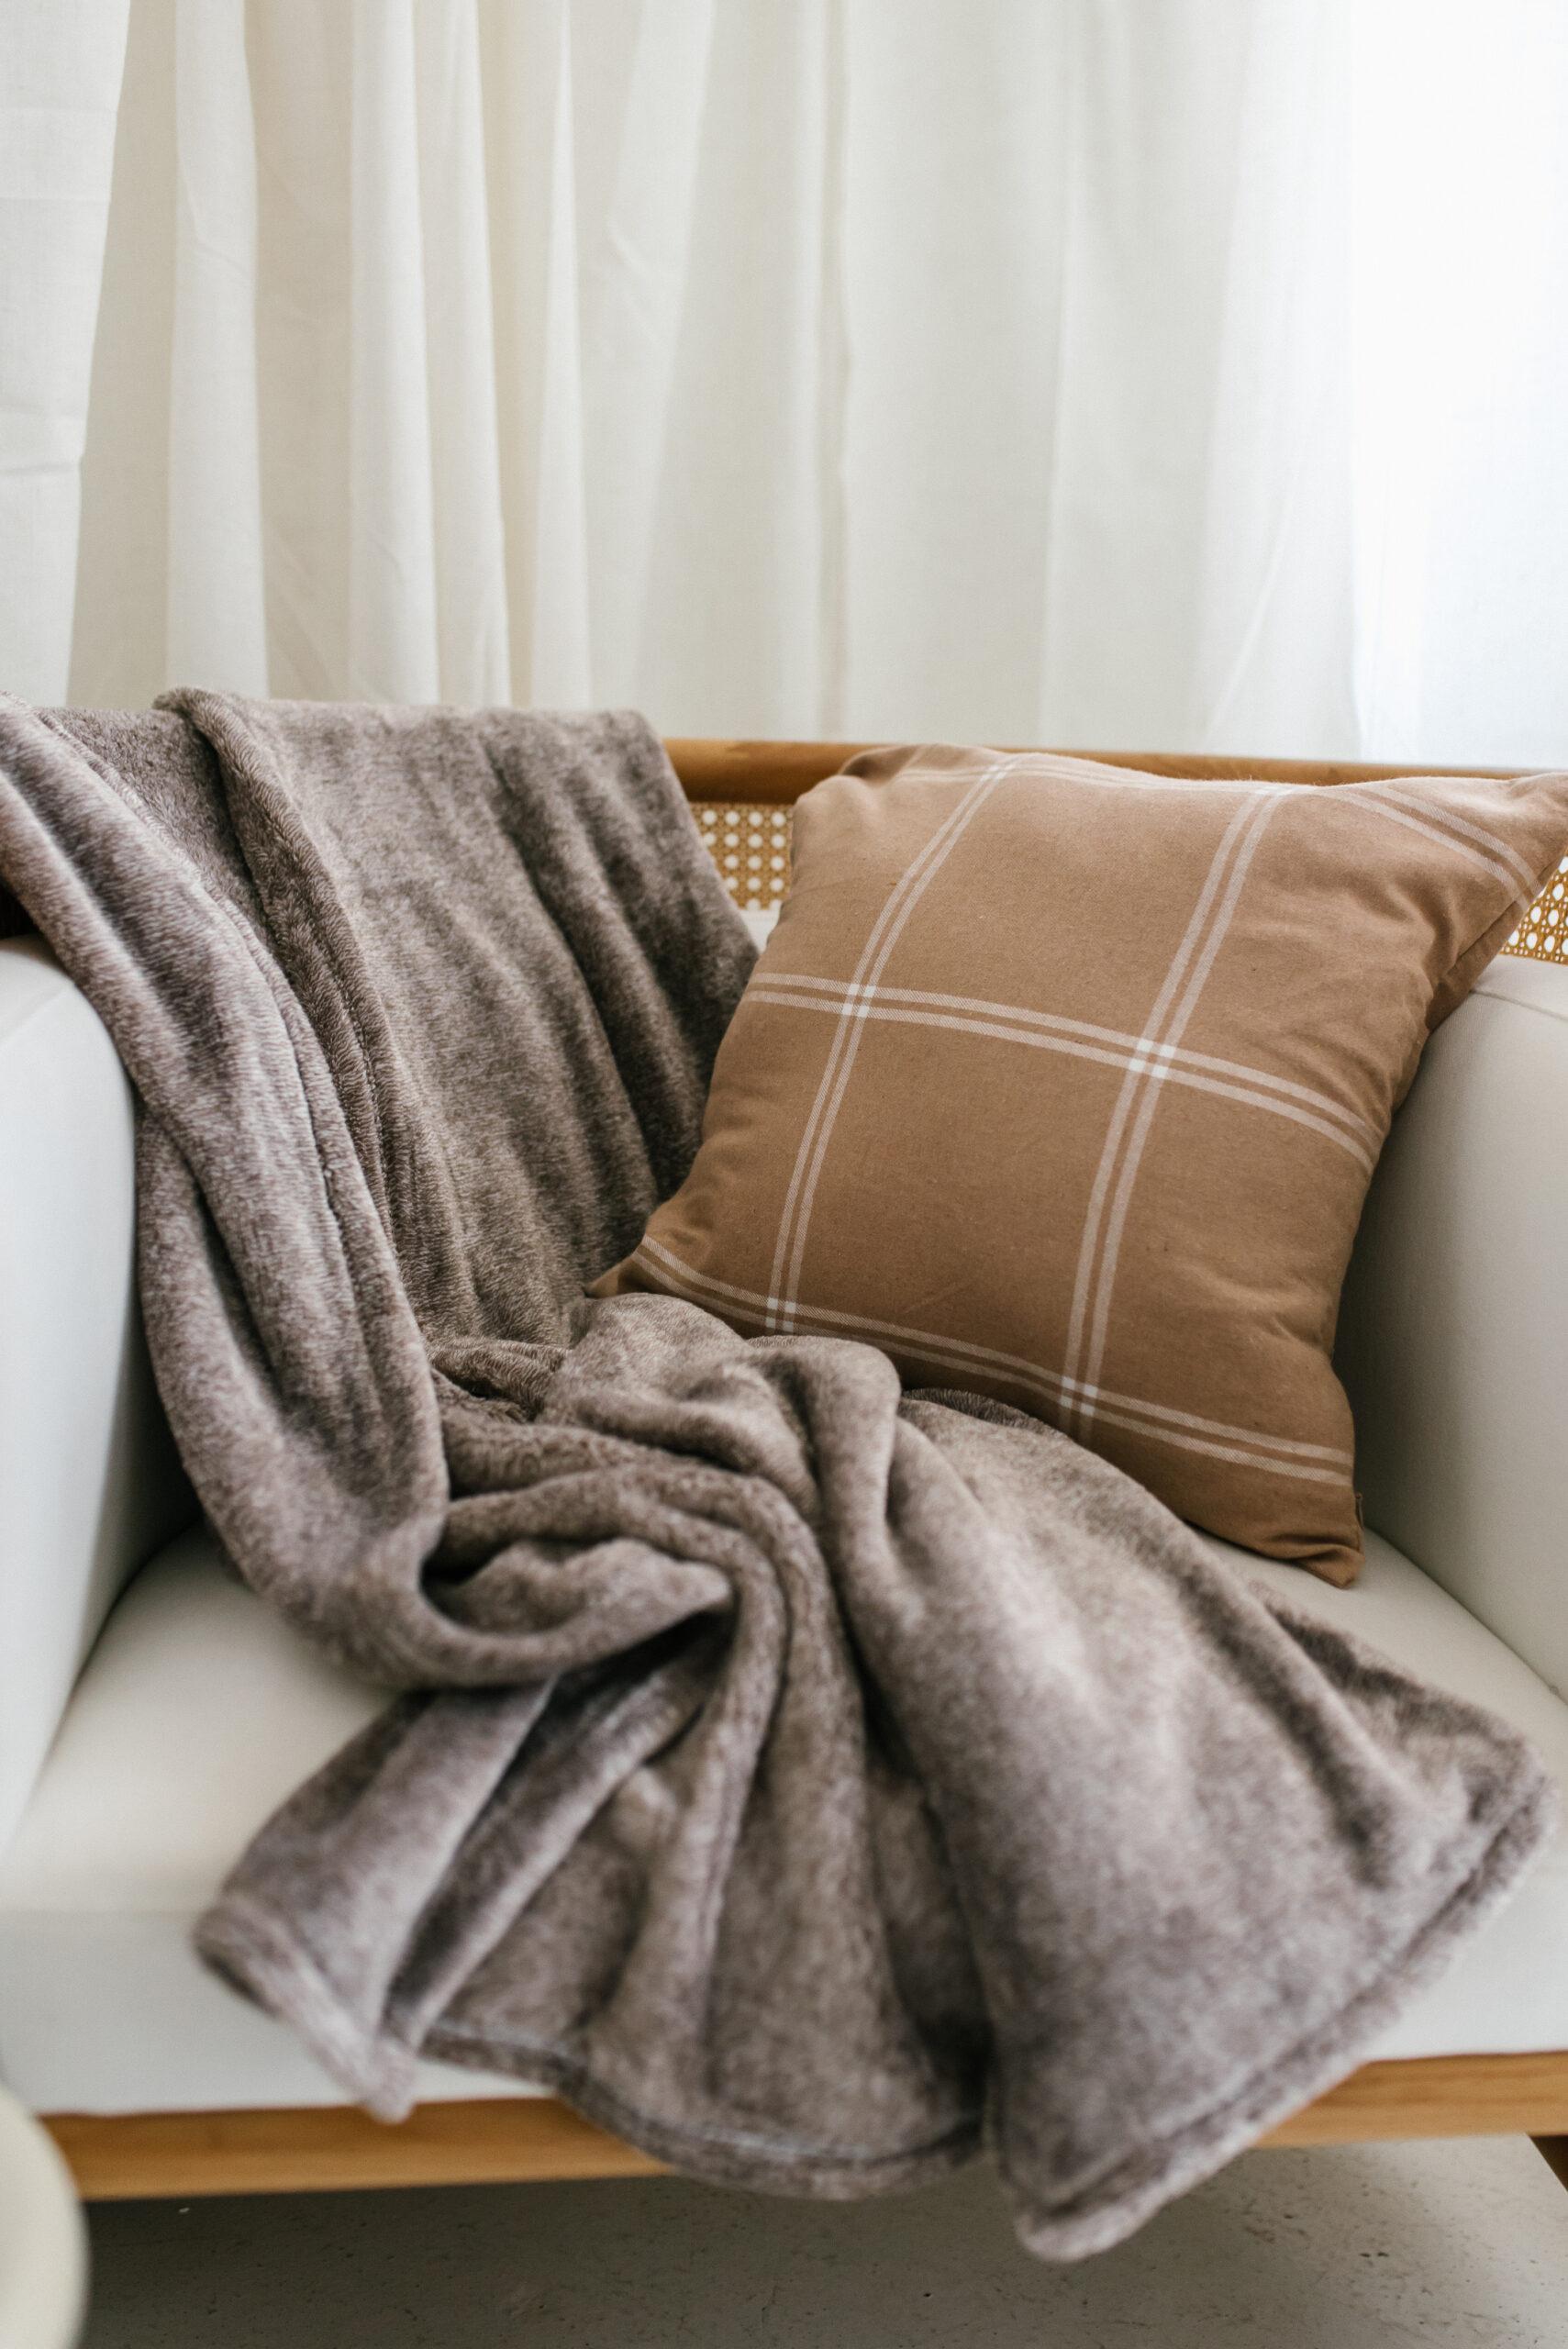 windowpane pillow throw, eco plush throw, pillow cover, fall decor